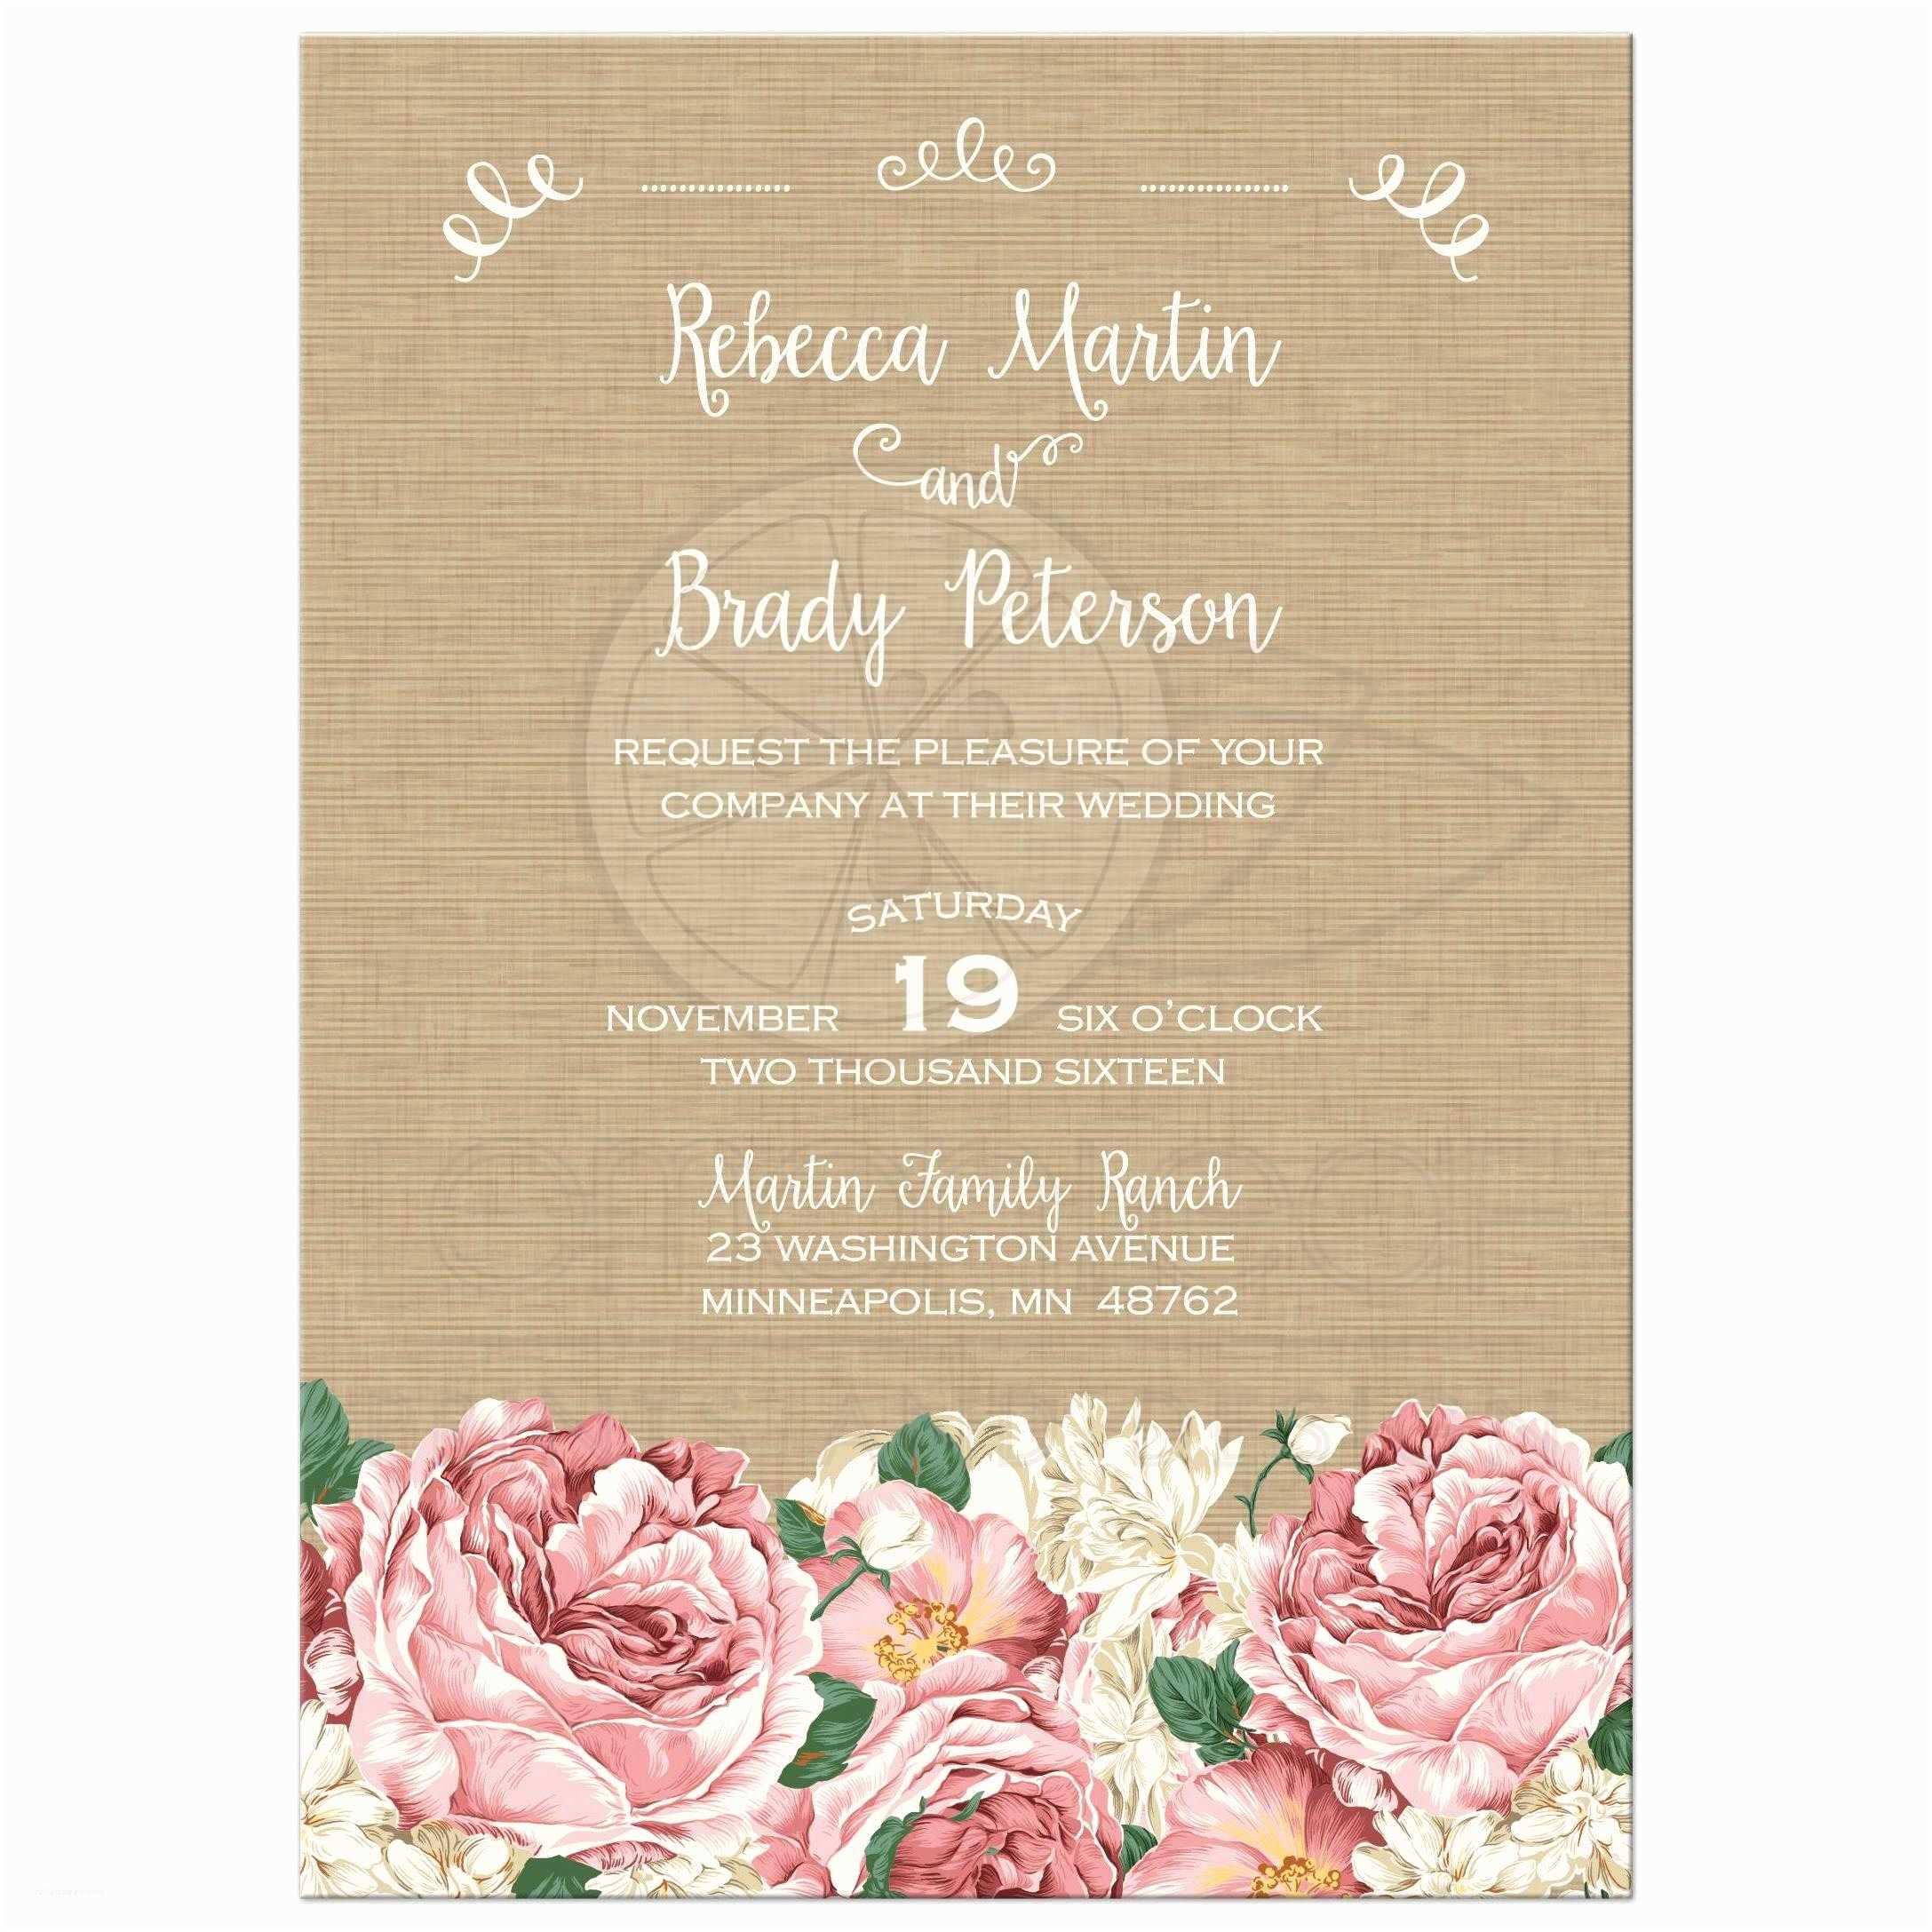 Peony Wedding Invitations Wedding Invitation Rustic Pink Peony Flowers On Canvas